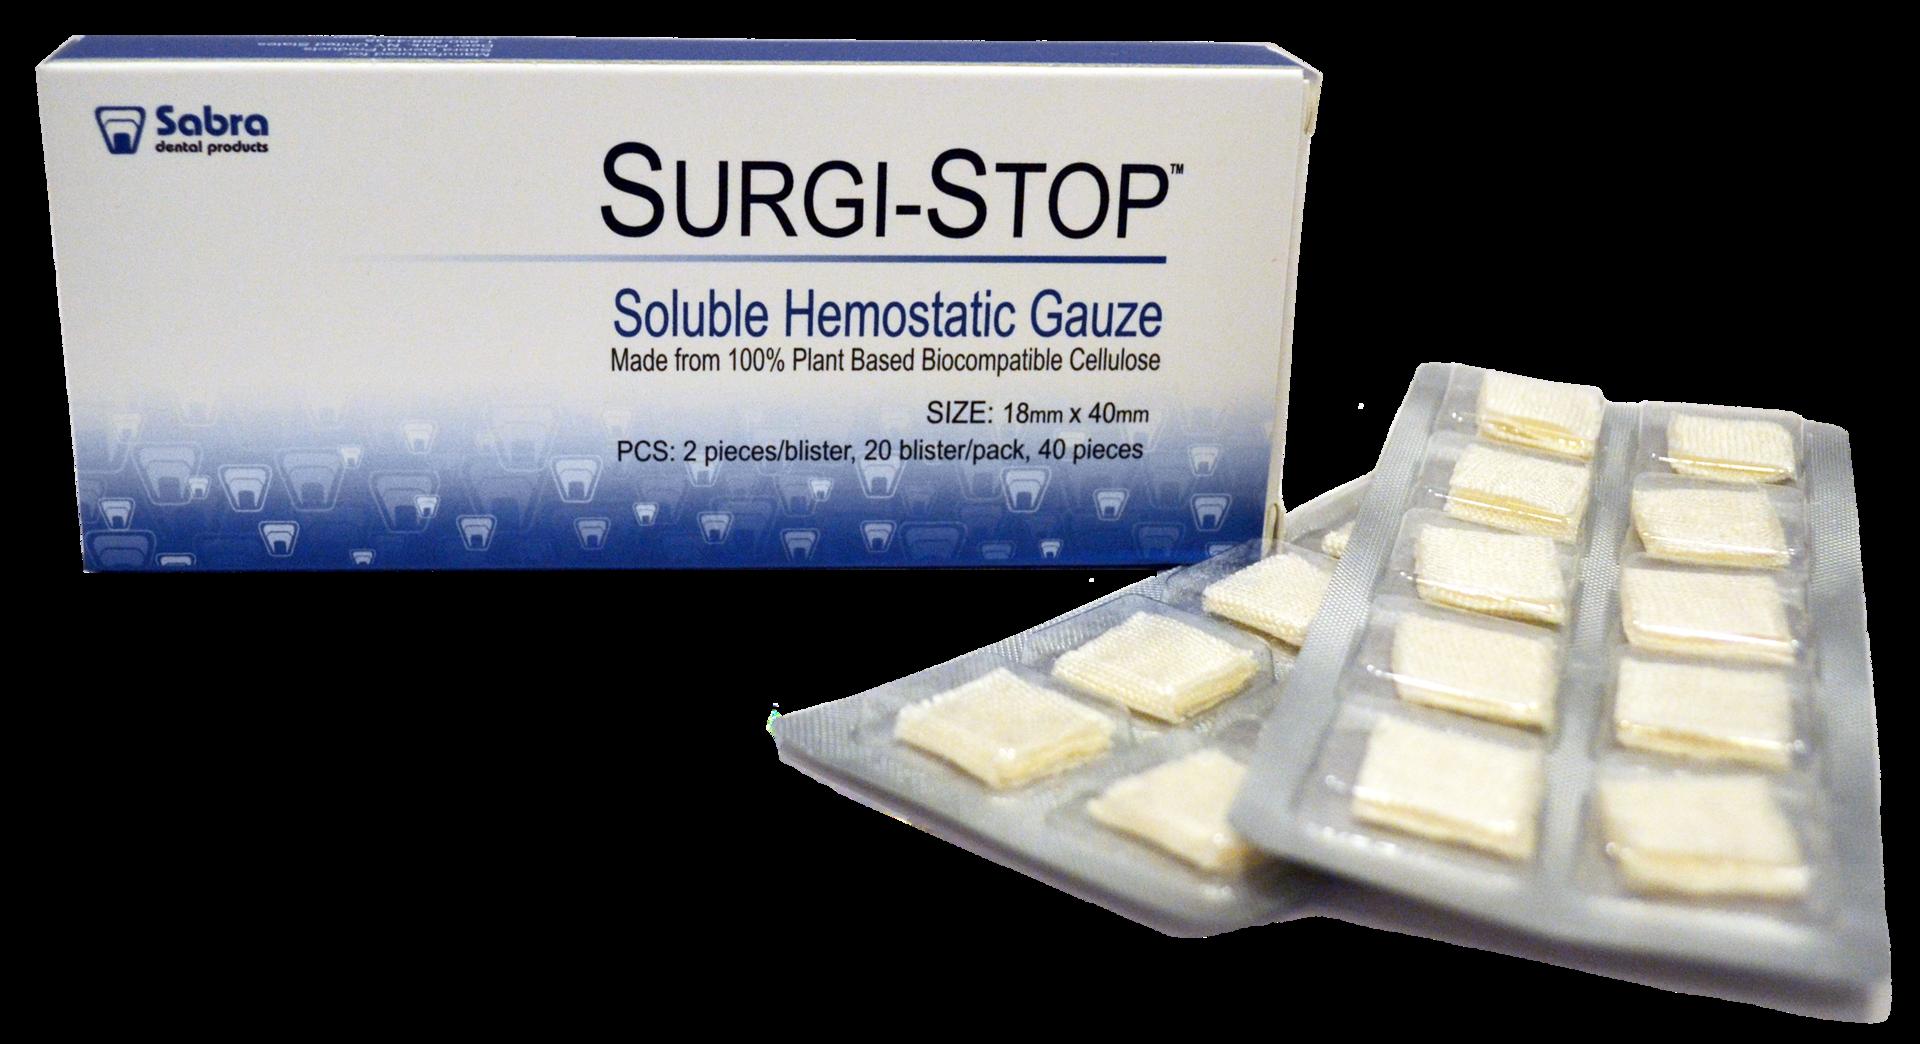 Surgi-stop Gauze Soluable Soluable Hemostatic Surgi-stop Surgi-stop Hemostatic Hemostatic Soluable Soluable Gauze Hemostatic Gauze Surgi-stop